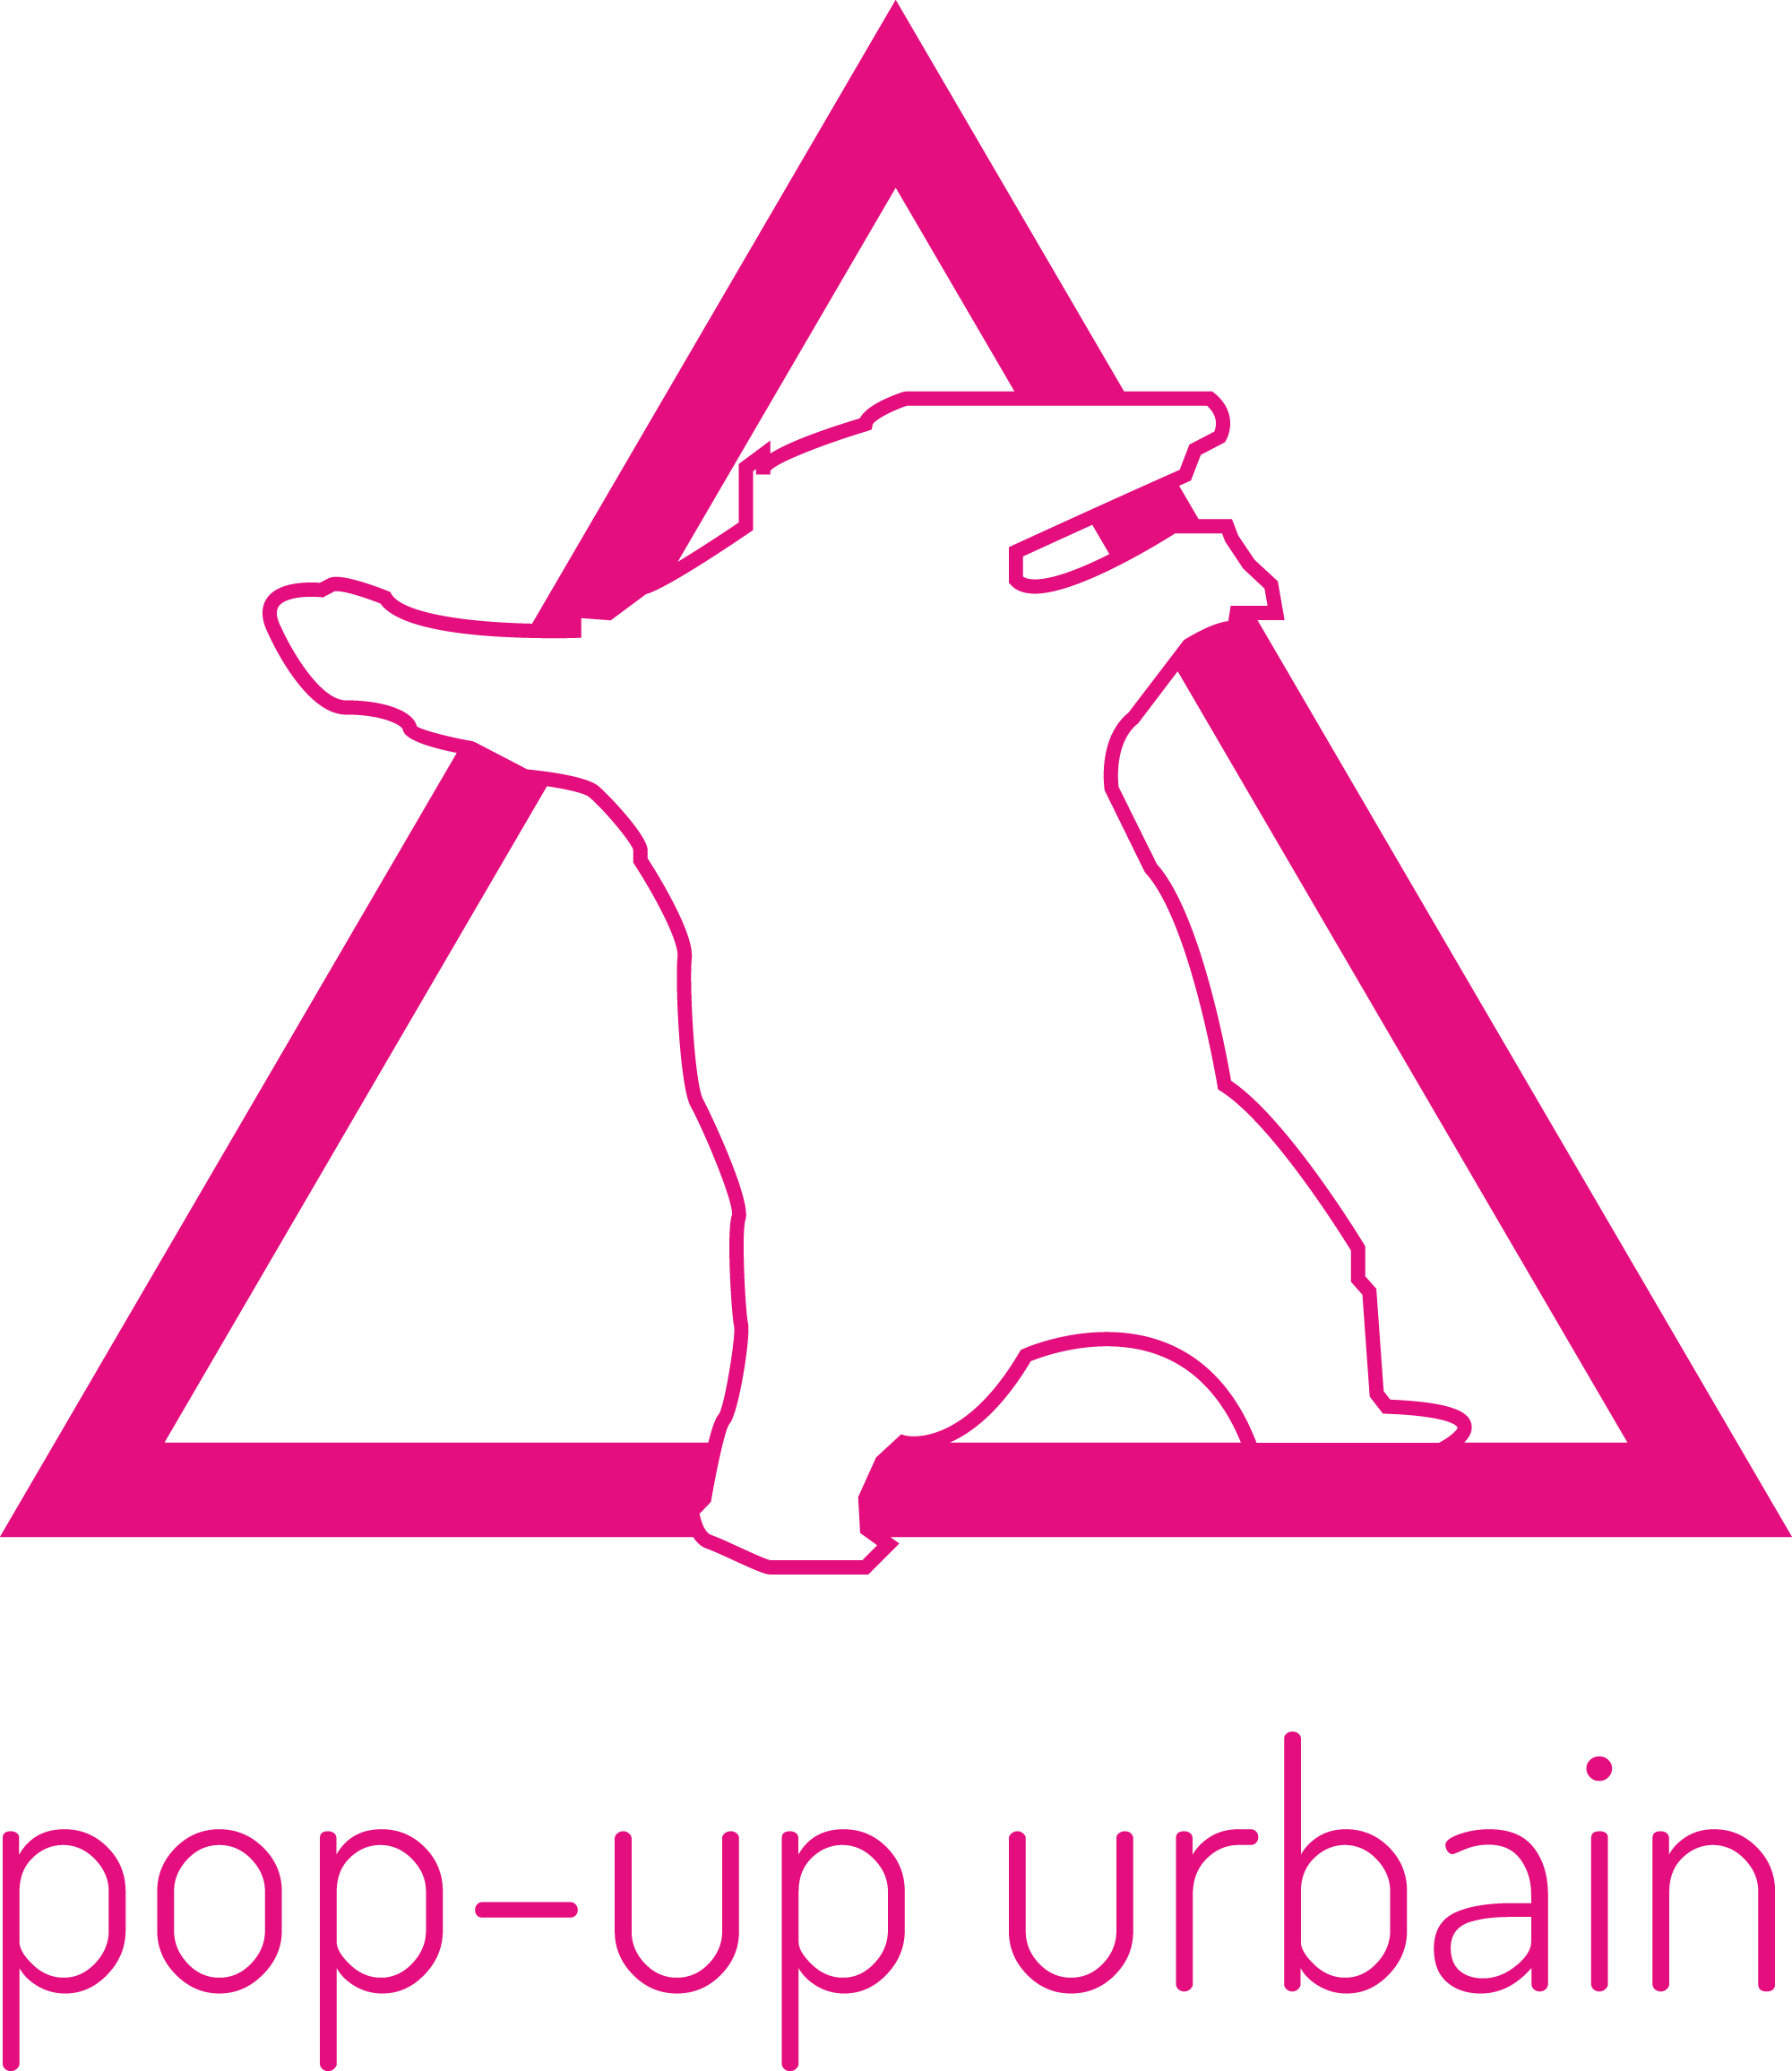 [pop-up] urbain